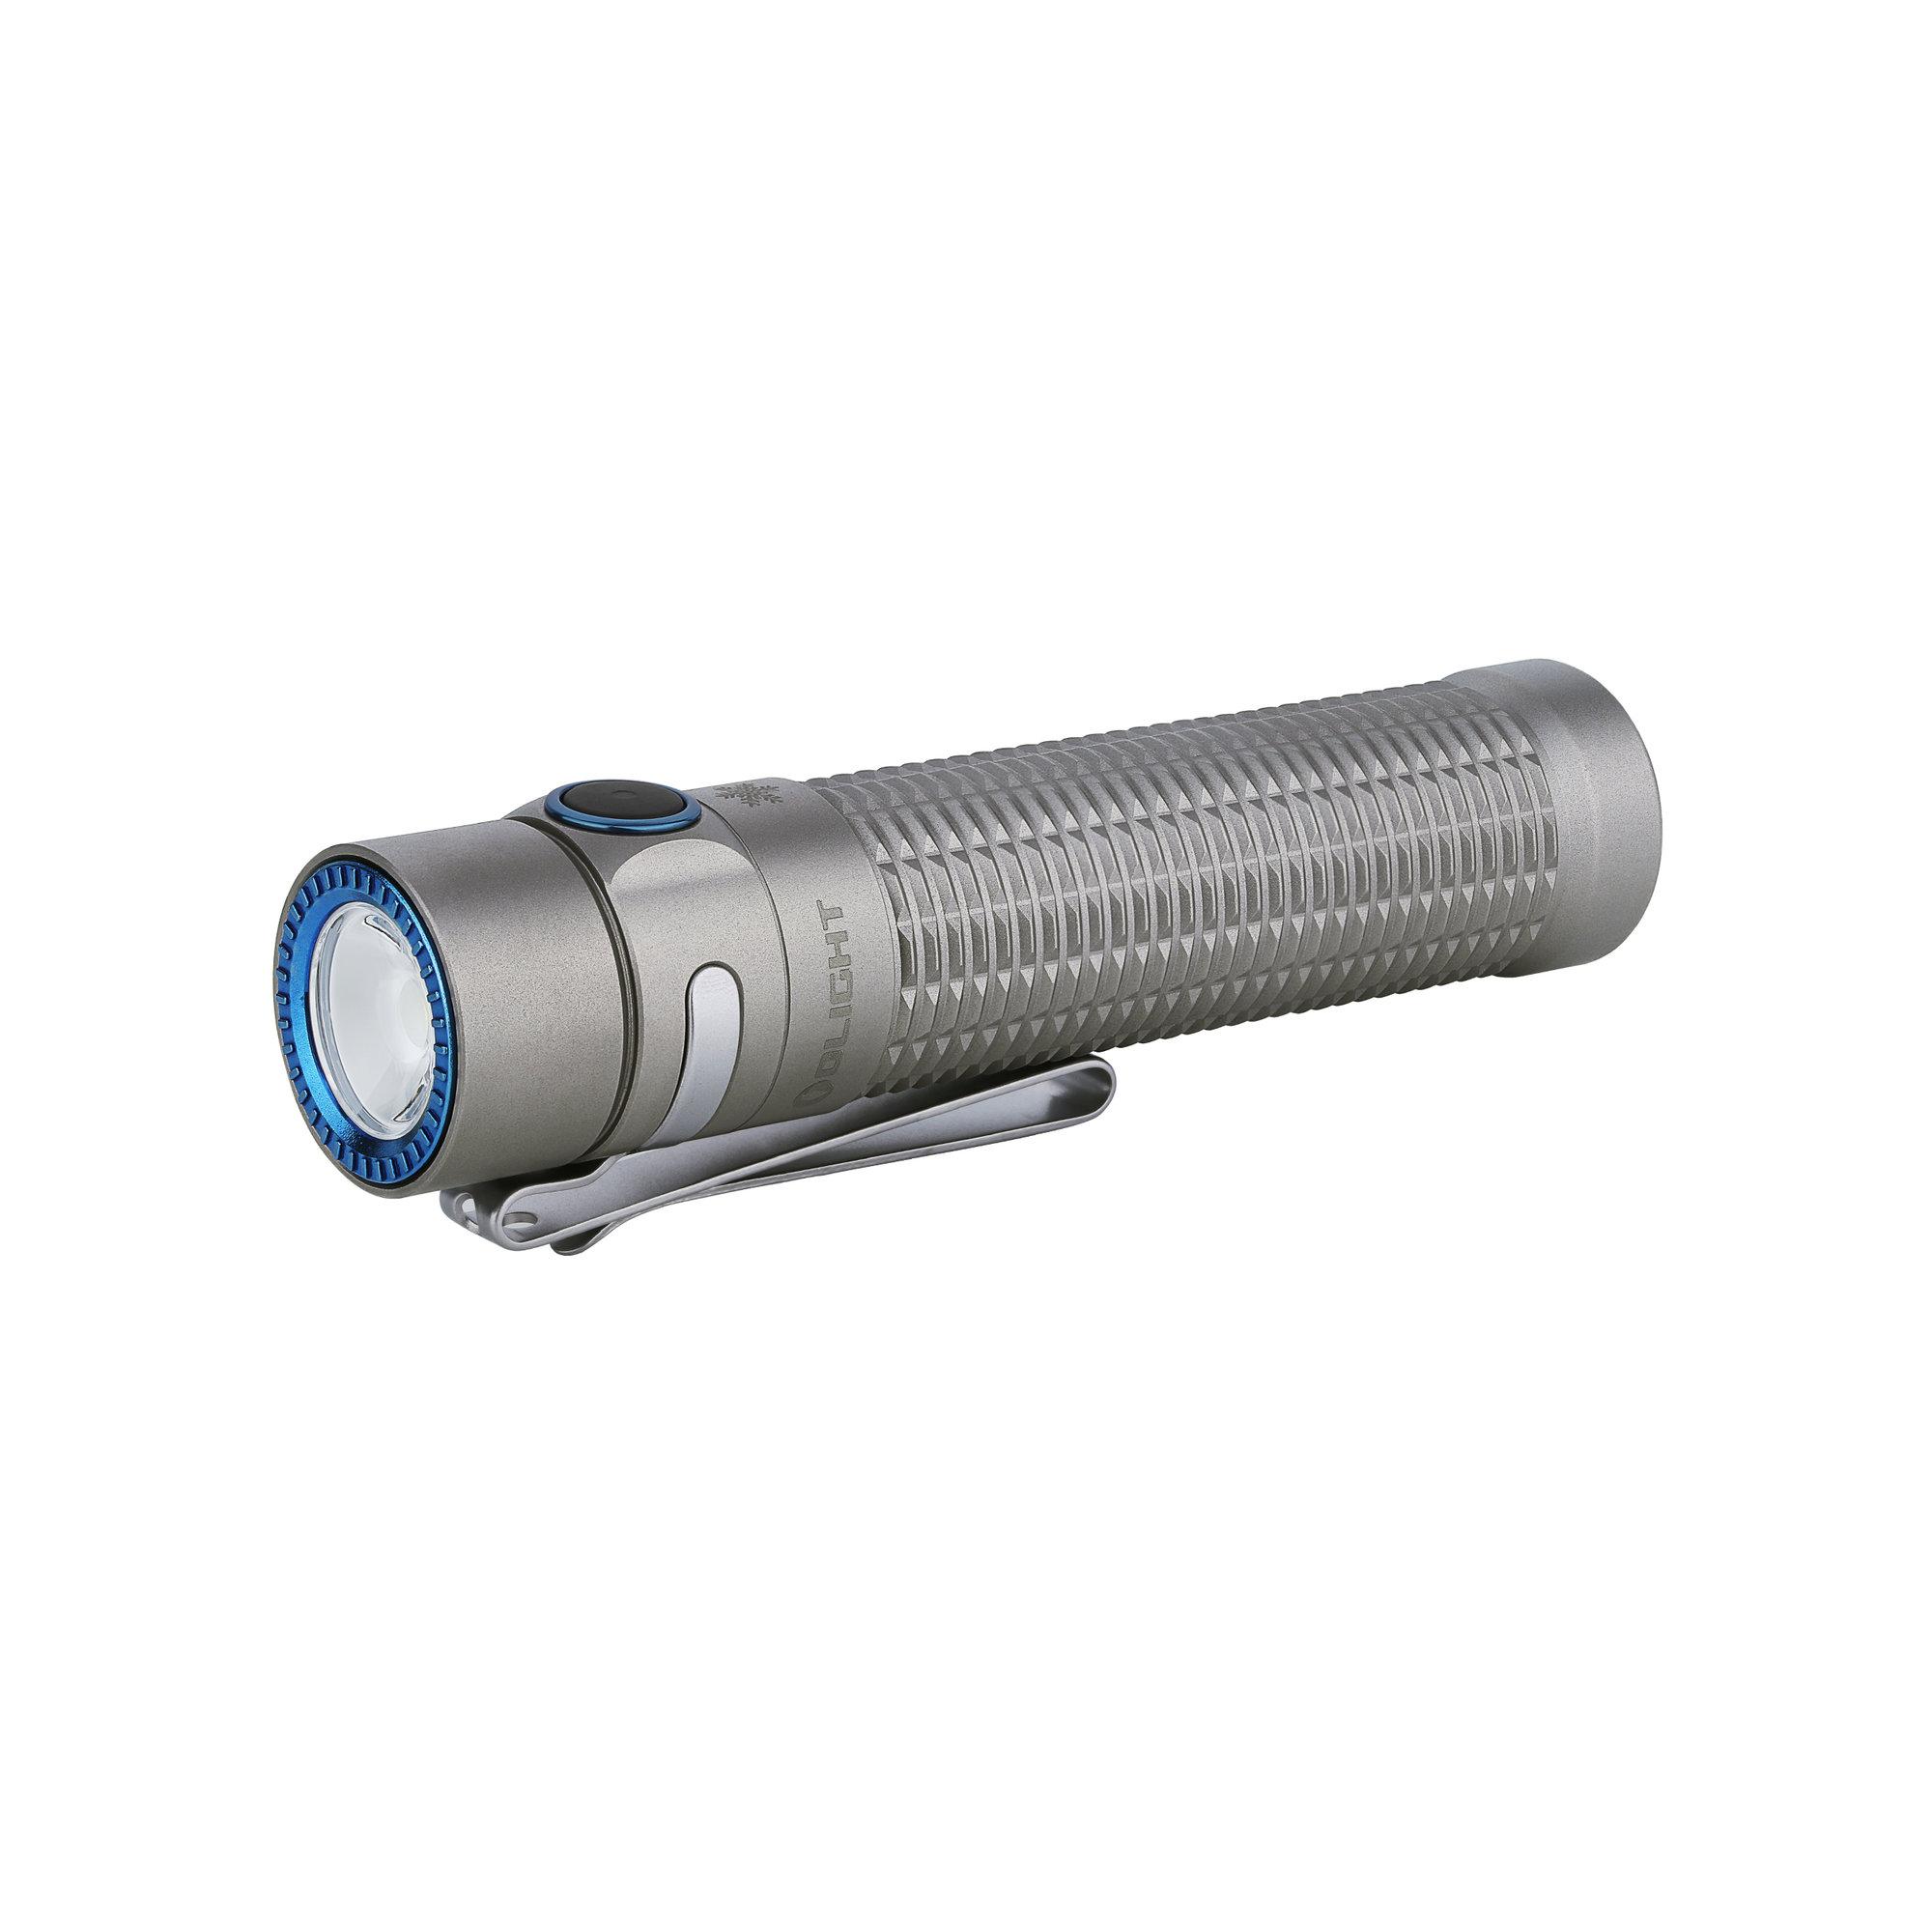 LED baterka Olight Warrior Mini 1500 lm - Winter 2 Limitovaná edícia